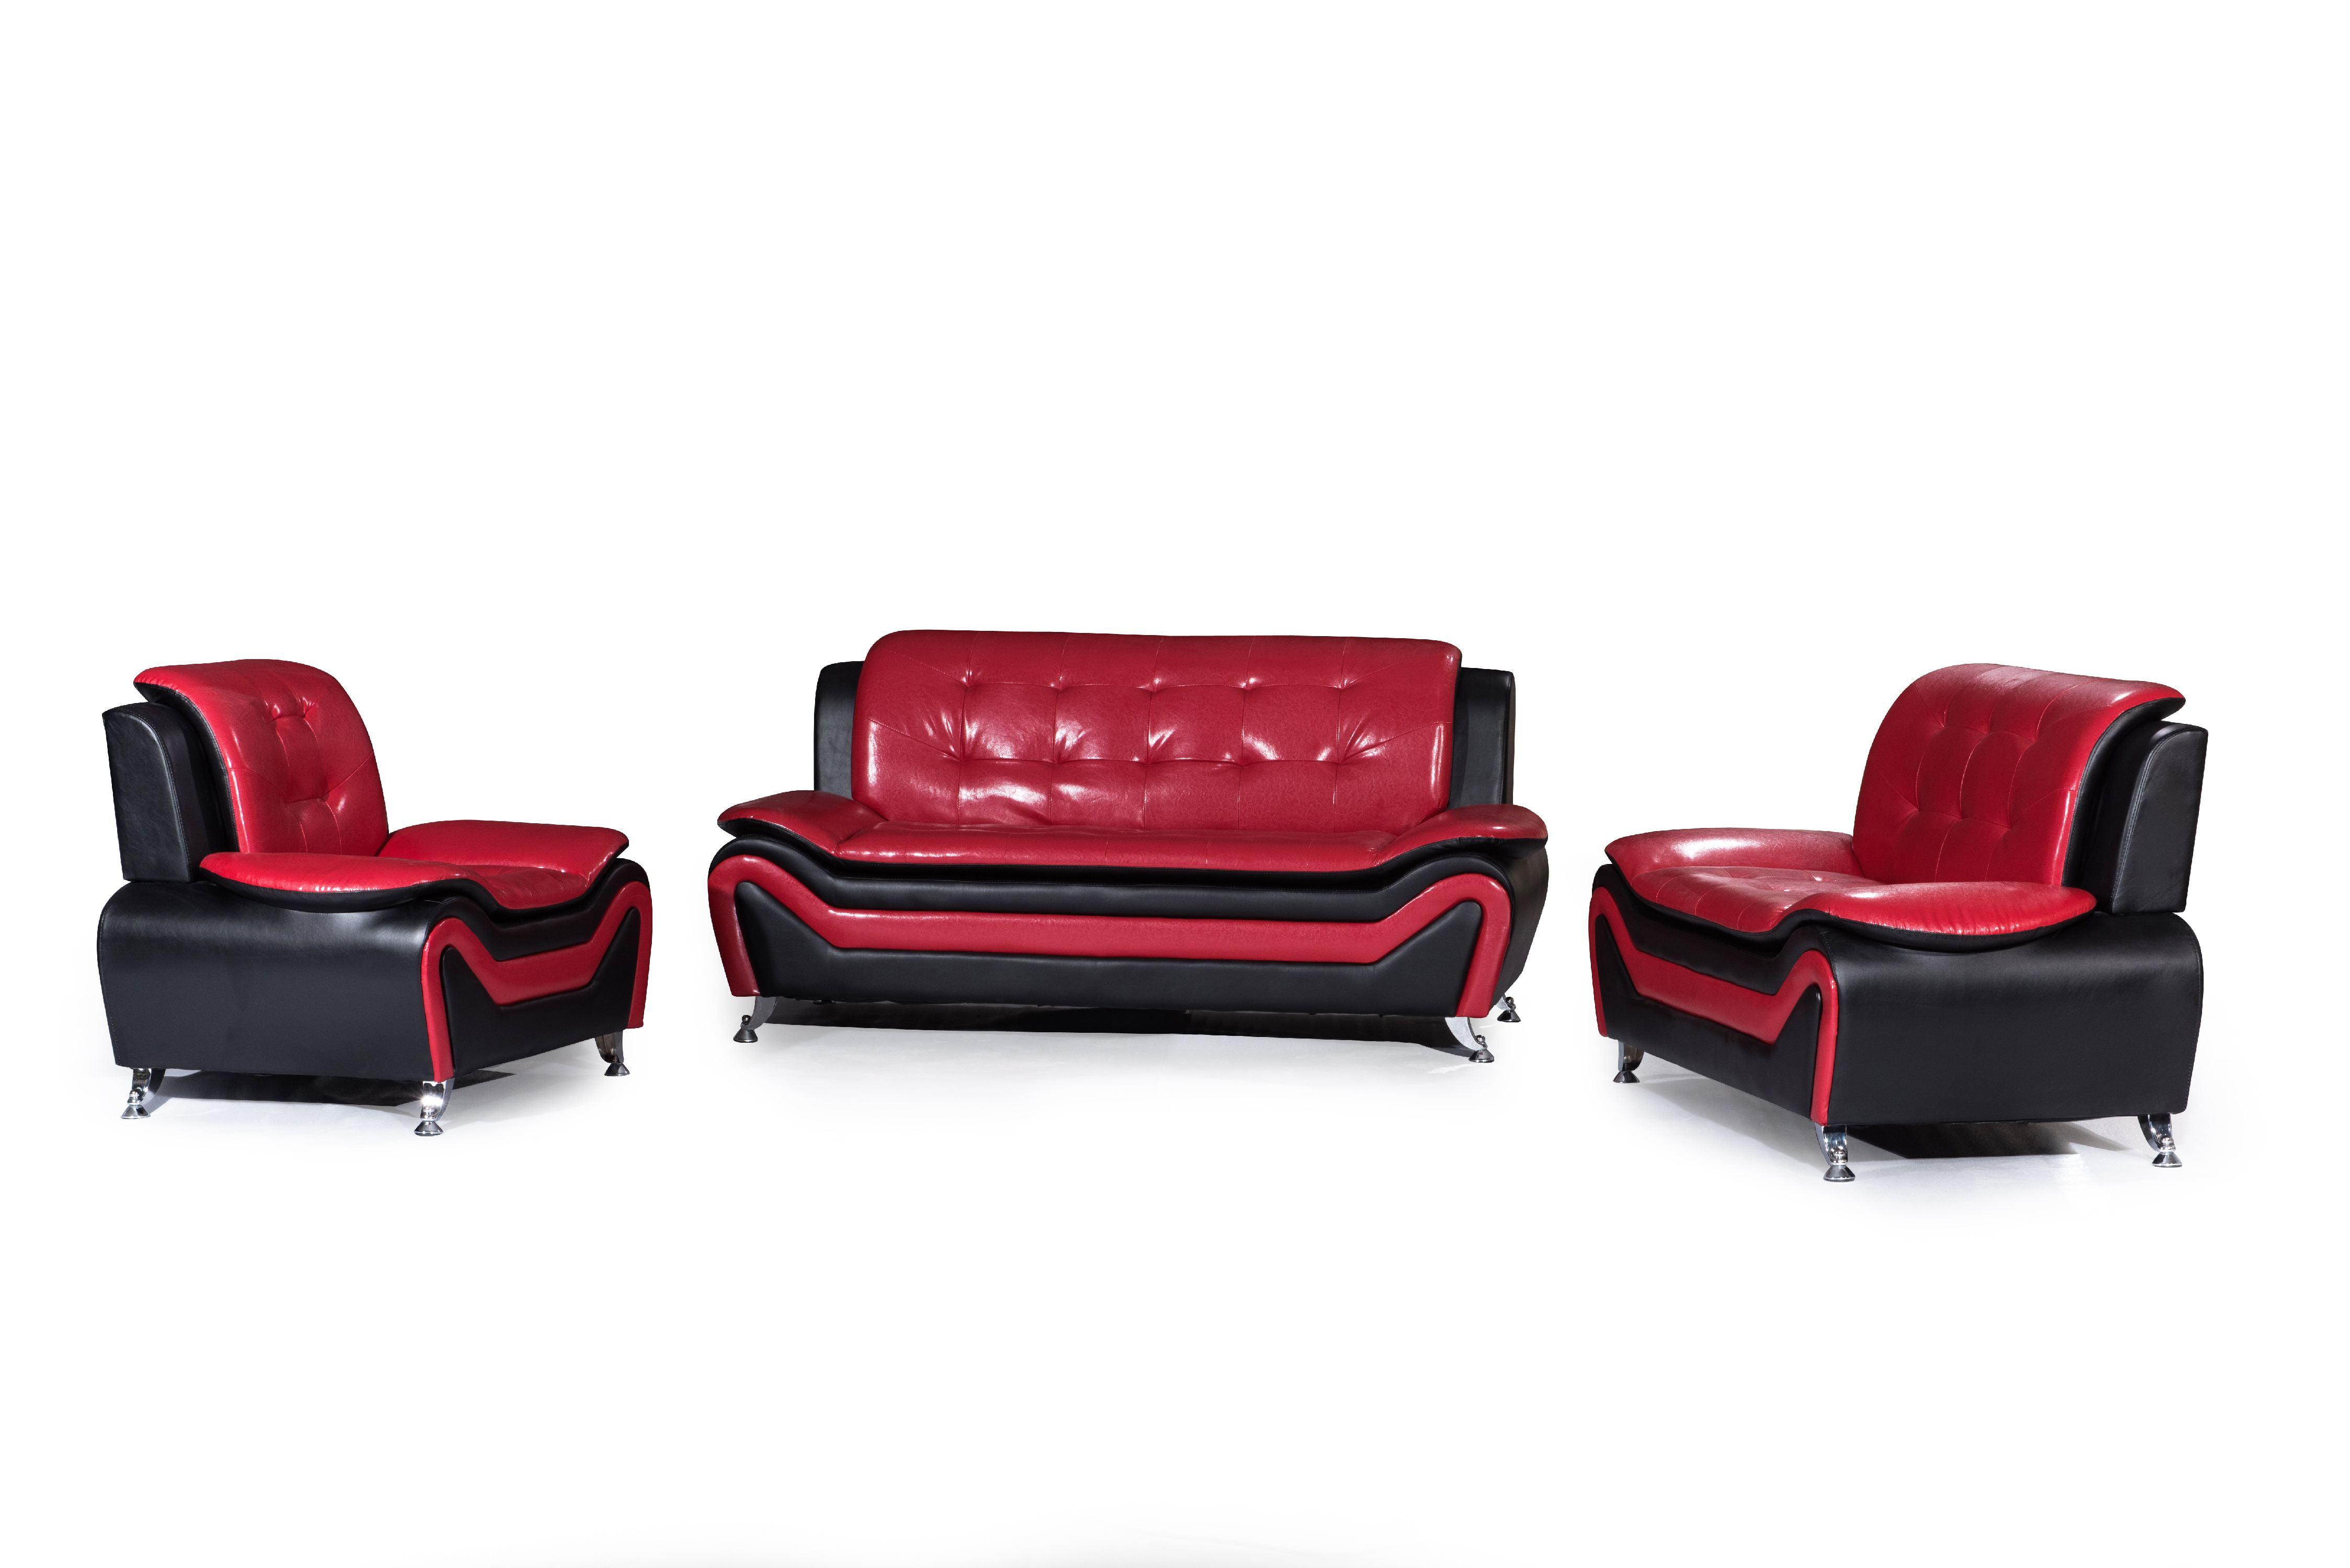 Chair Option Loveseat Sofa Wanda White//Black Bonded Leather Sofa Set-3PC 2PC